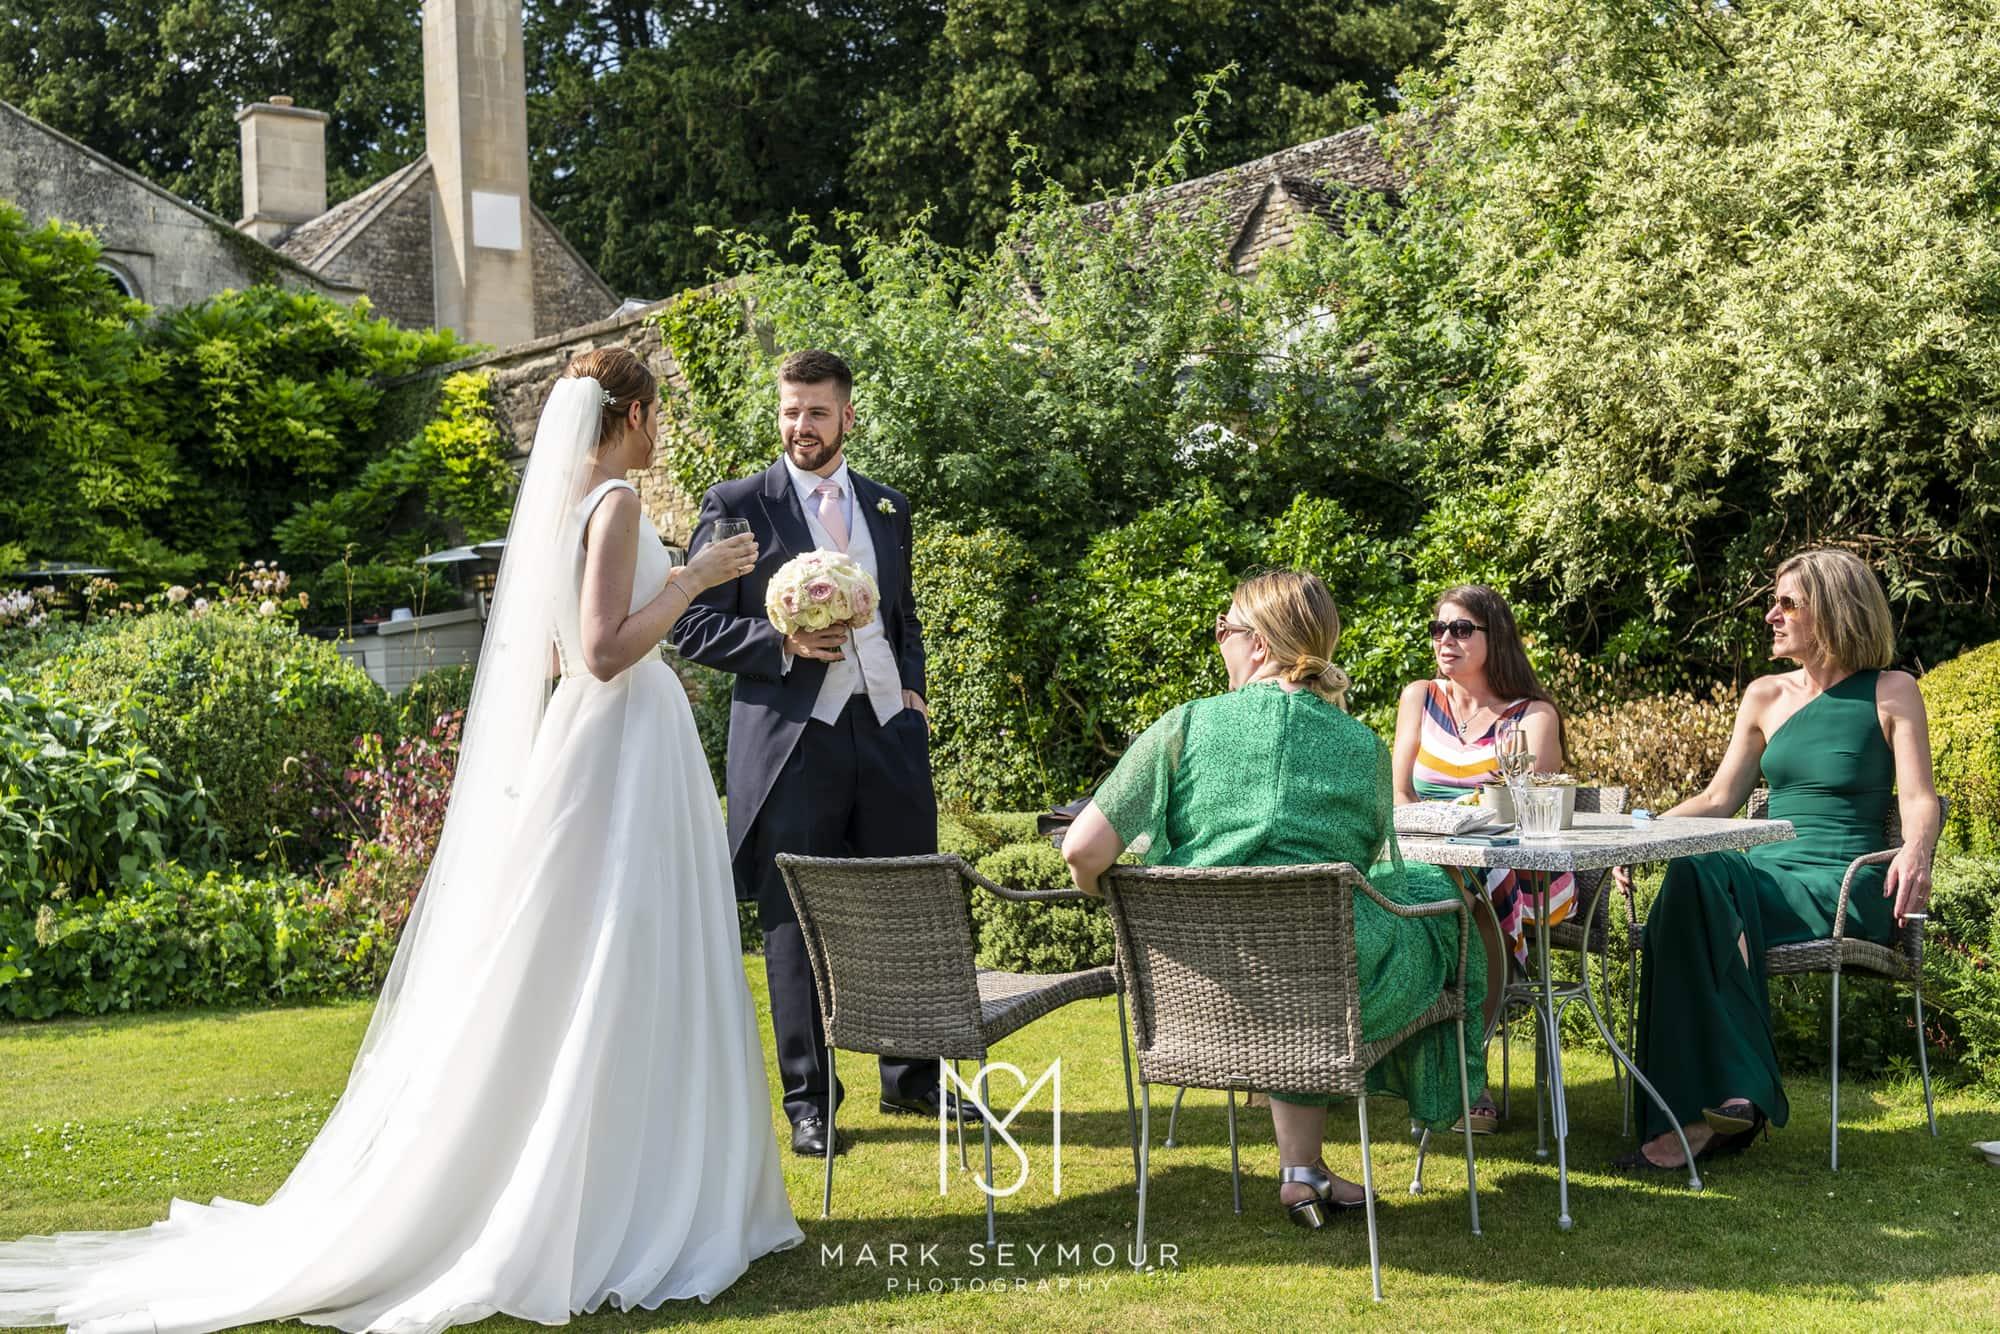 Barnsley House Wedding Photographer - Olivia and James' wedding 16